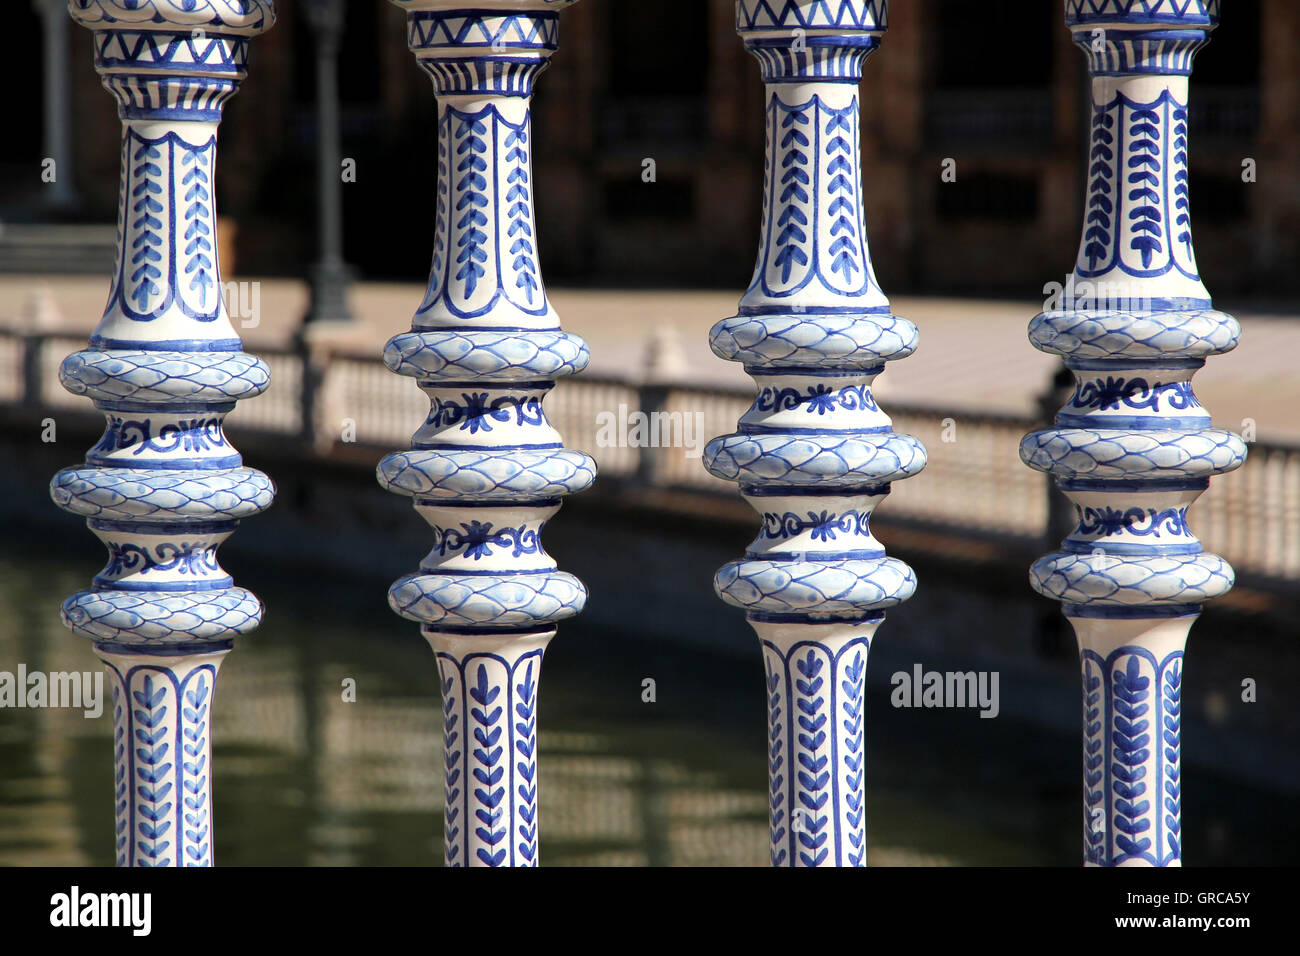 Plaza De Espana Sevilla - Stock Image